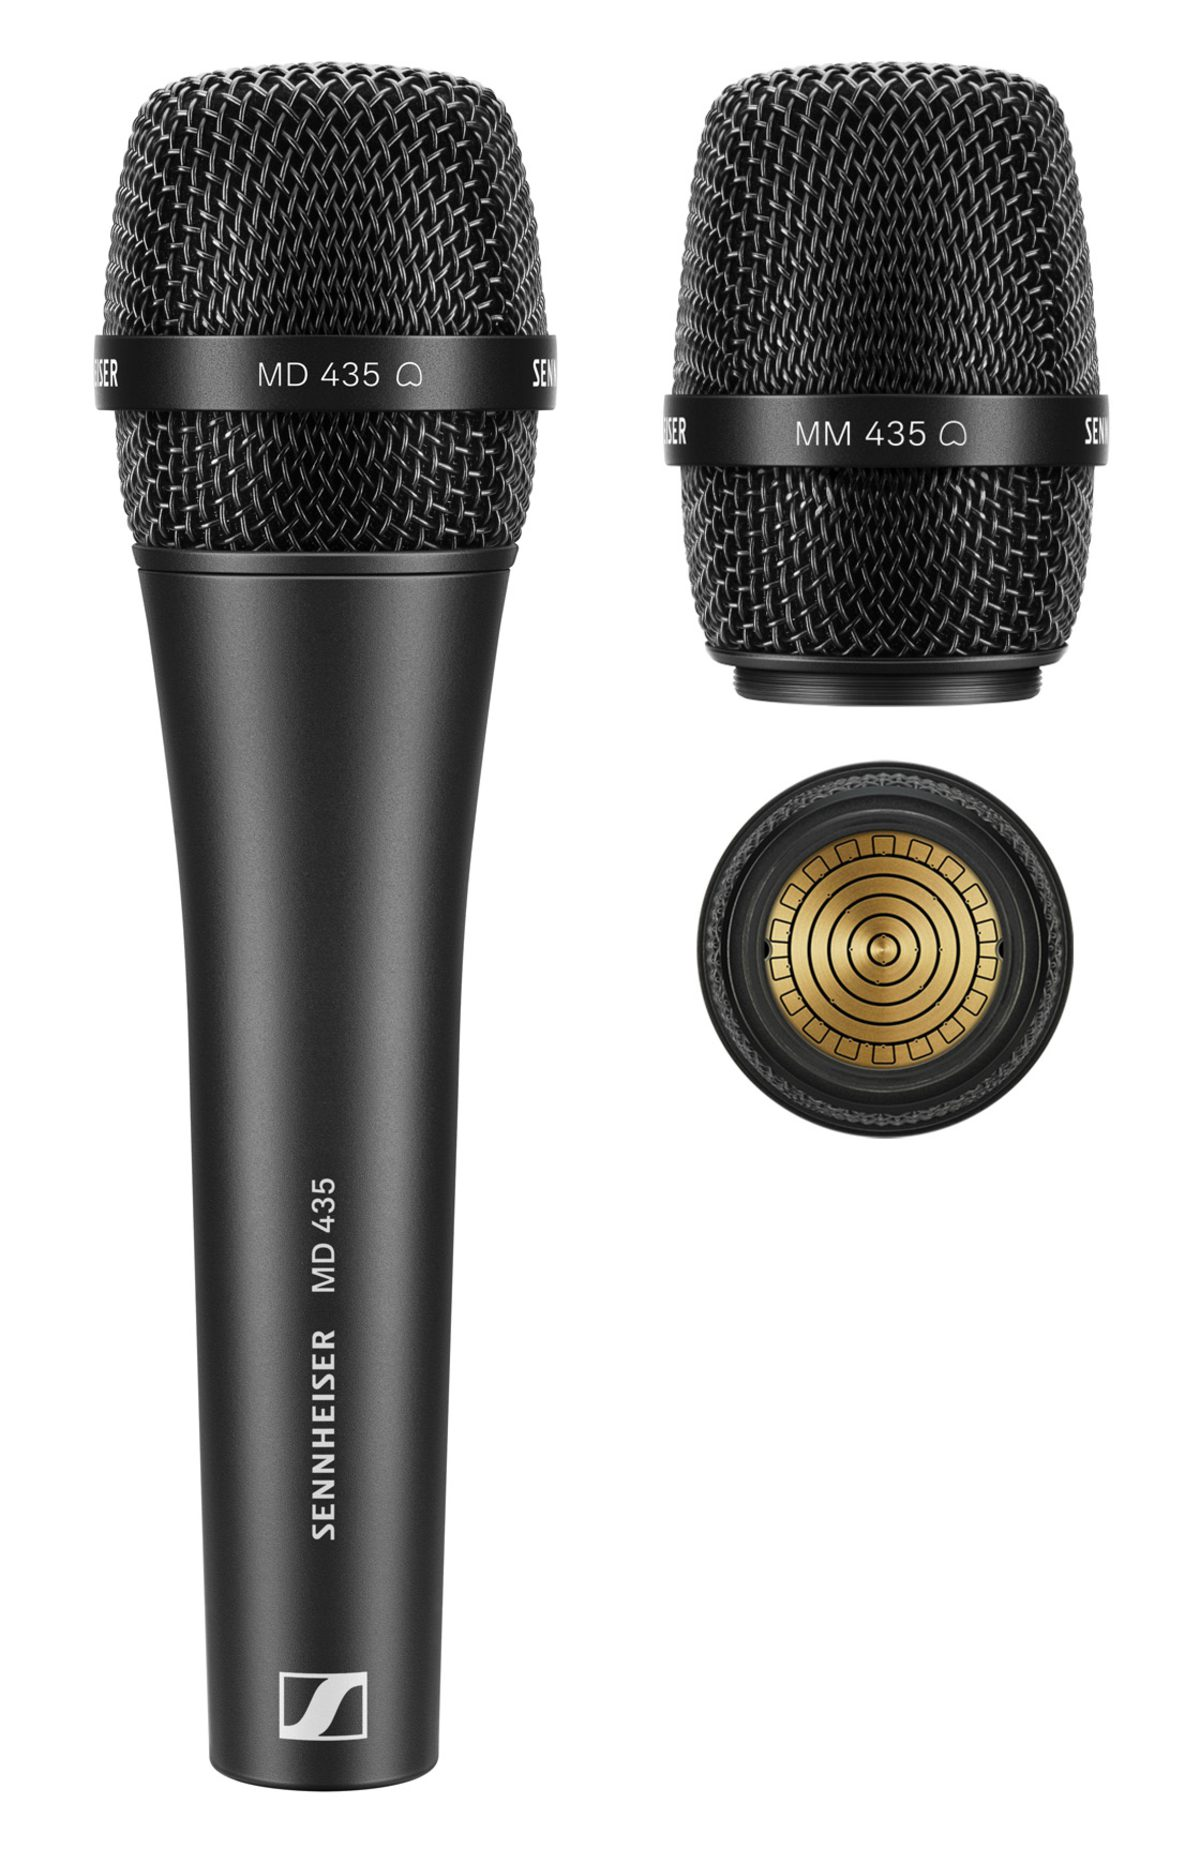 Micrófono vocal cardioide MD 435 alámbrico y cápsula MM 435 de Sennheiser